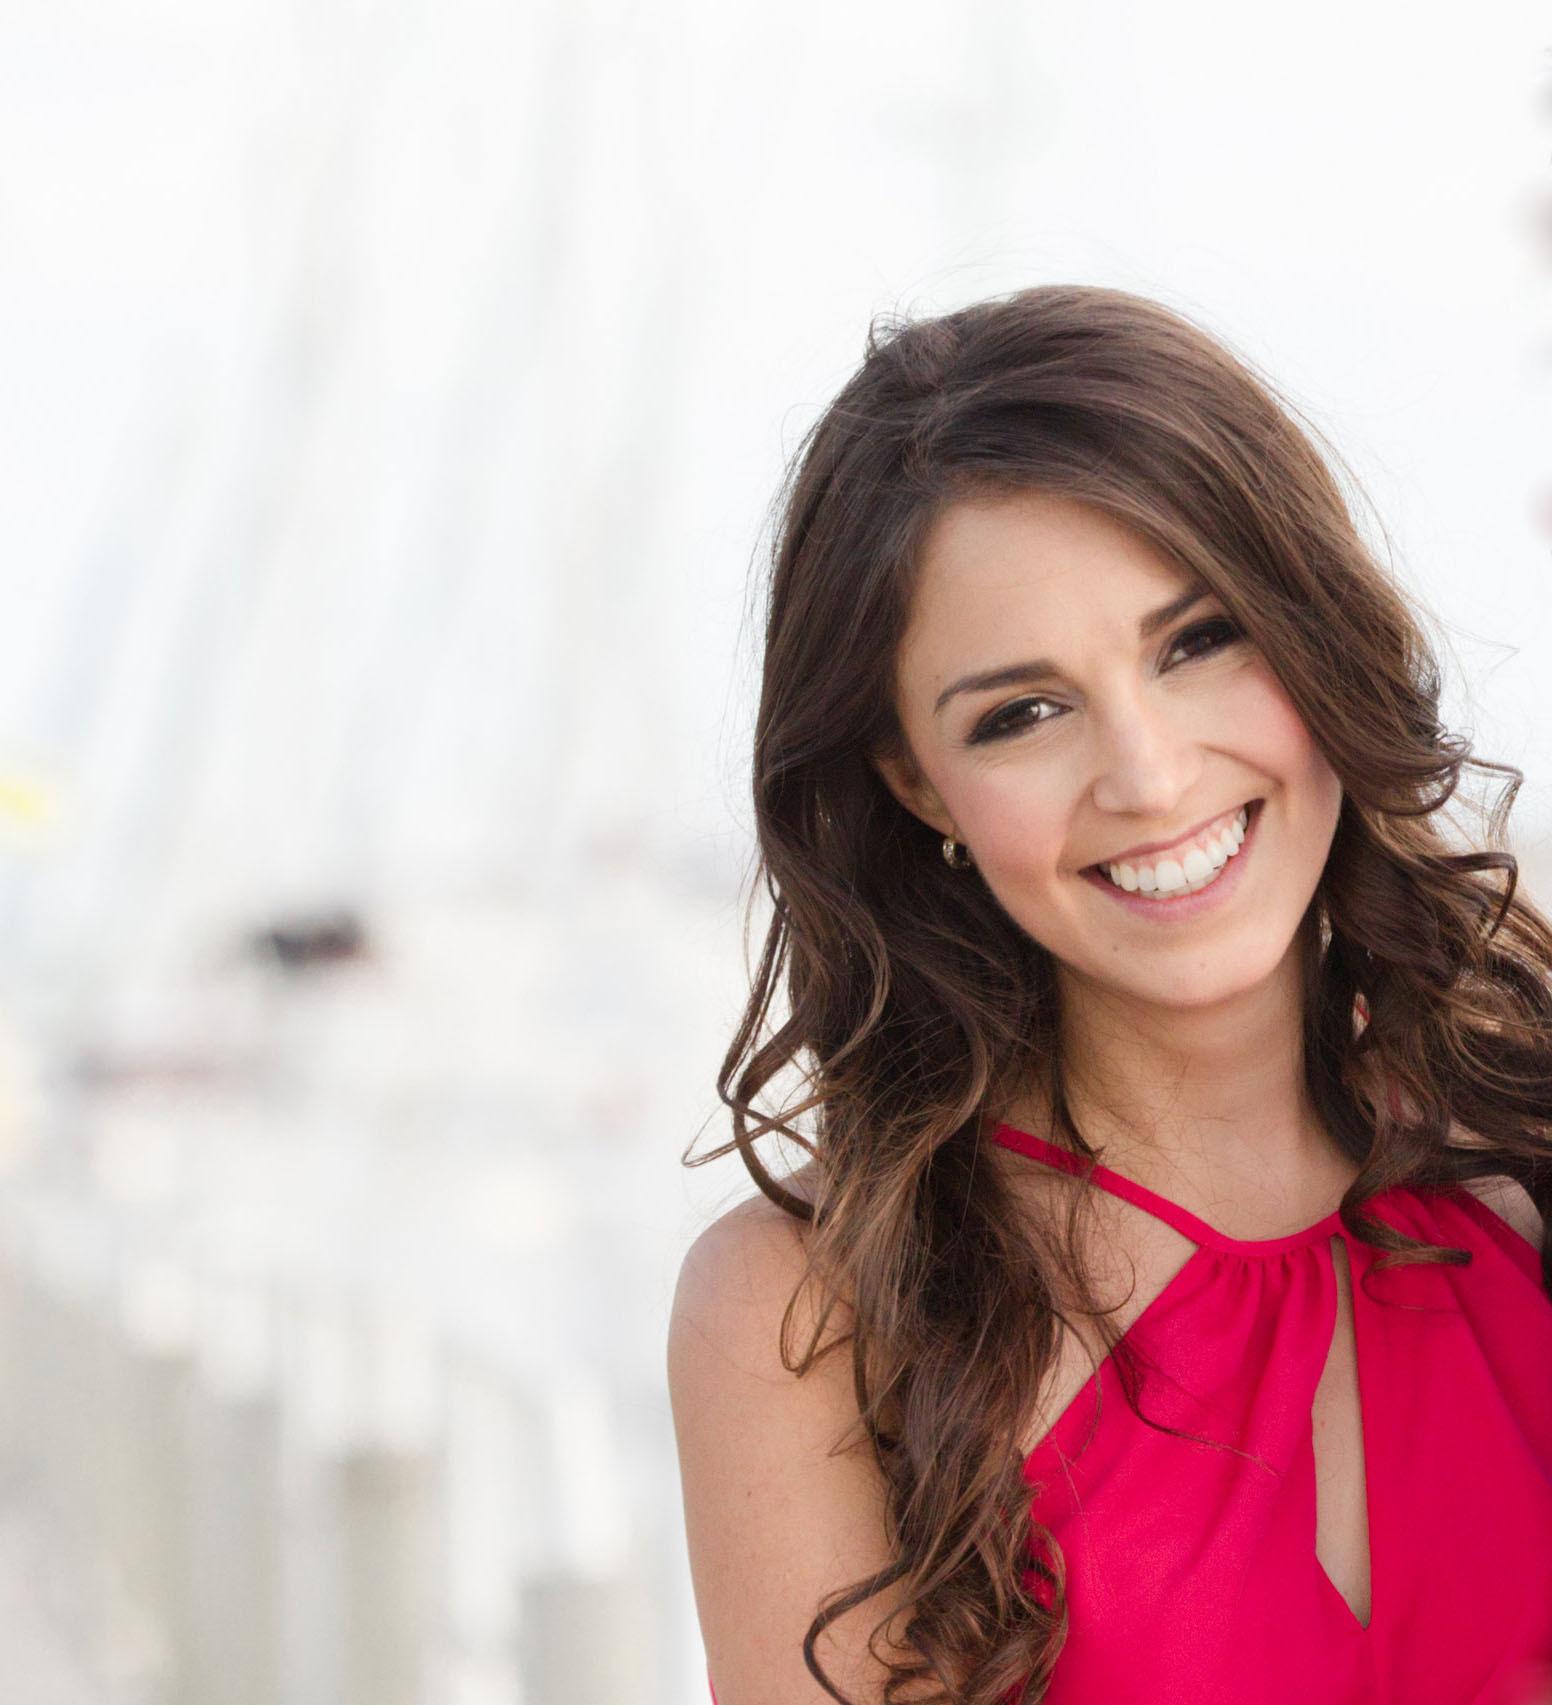 Vanessa delray